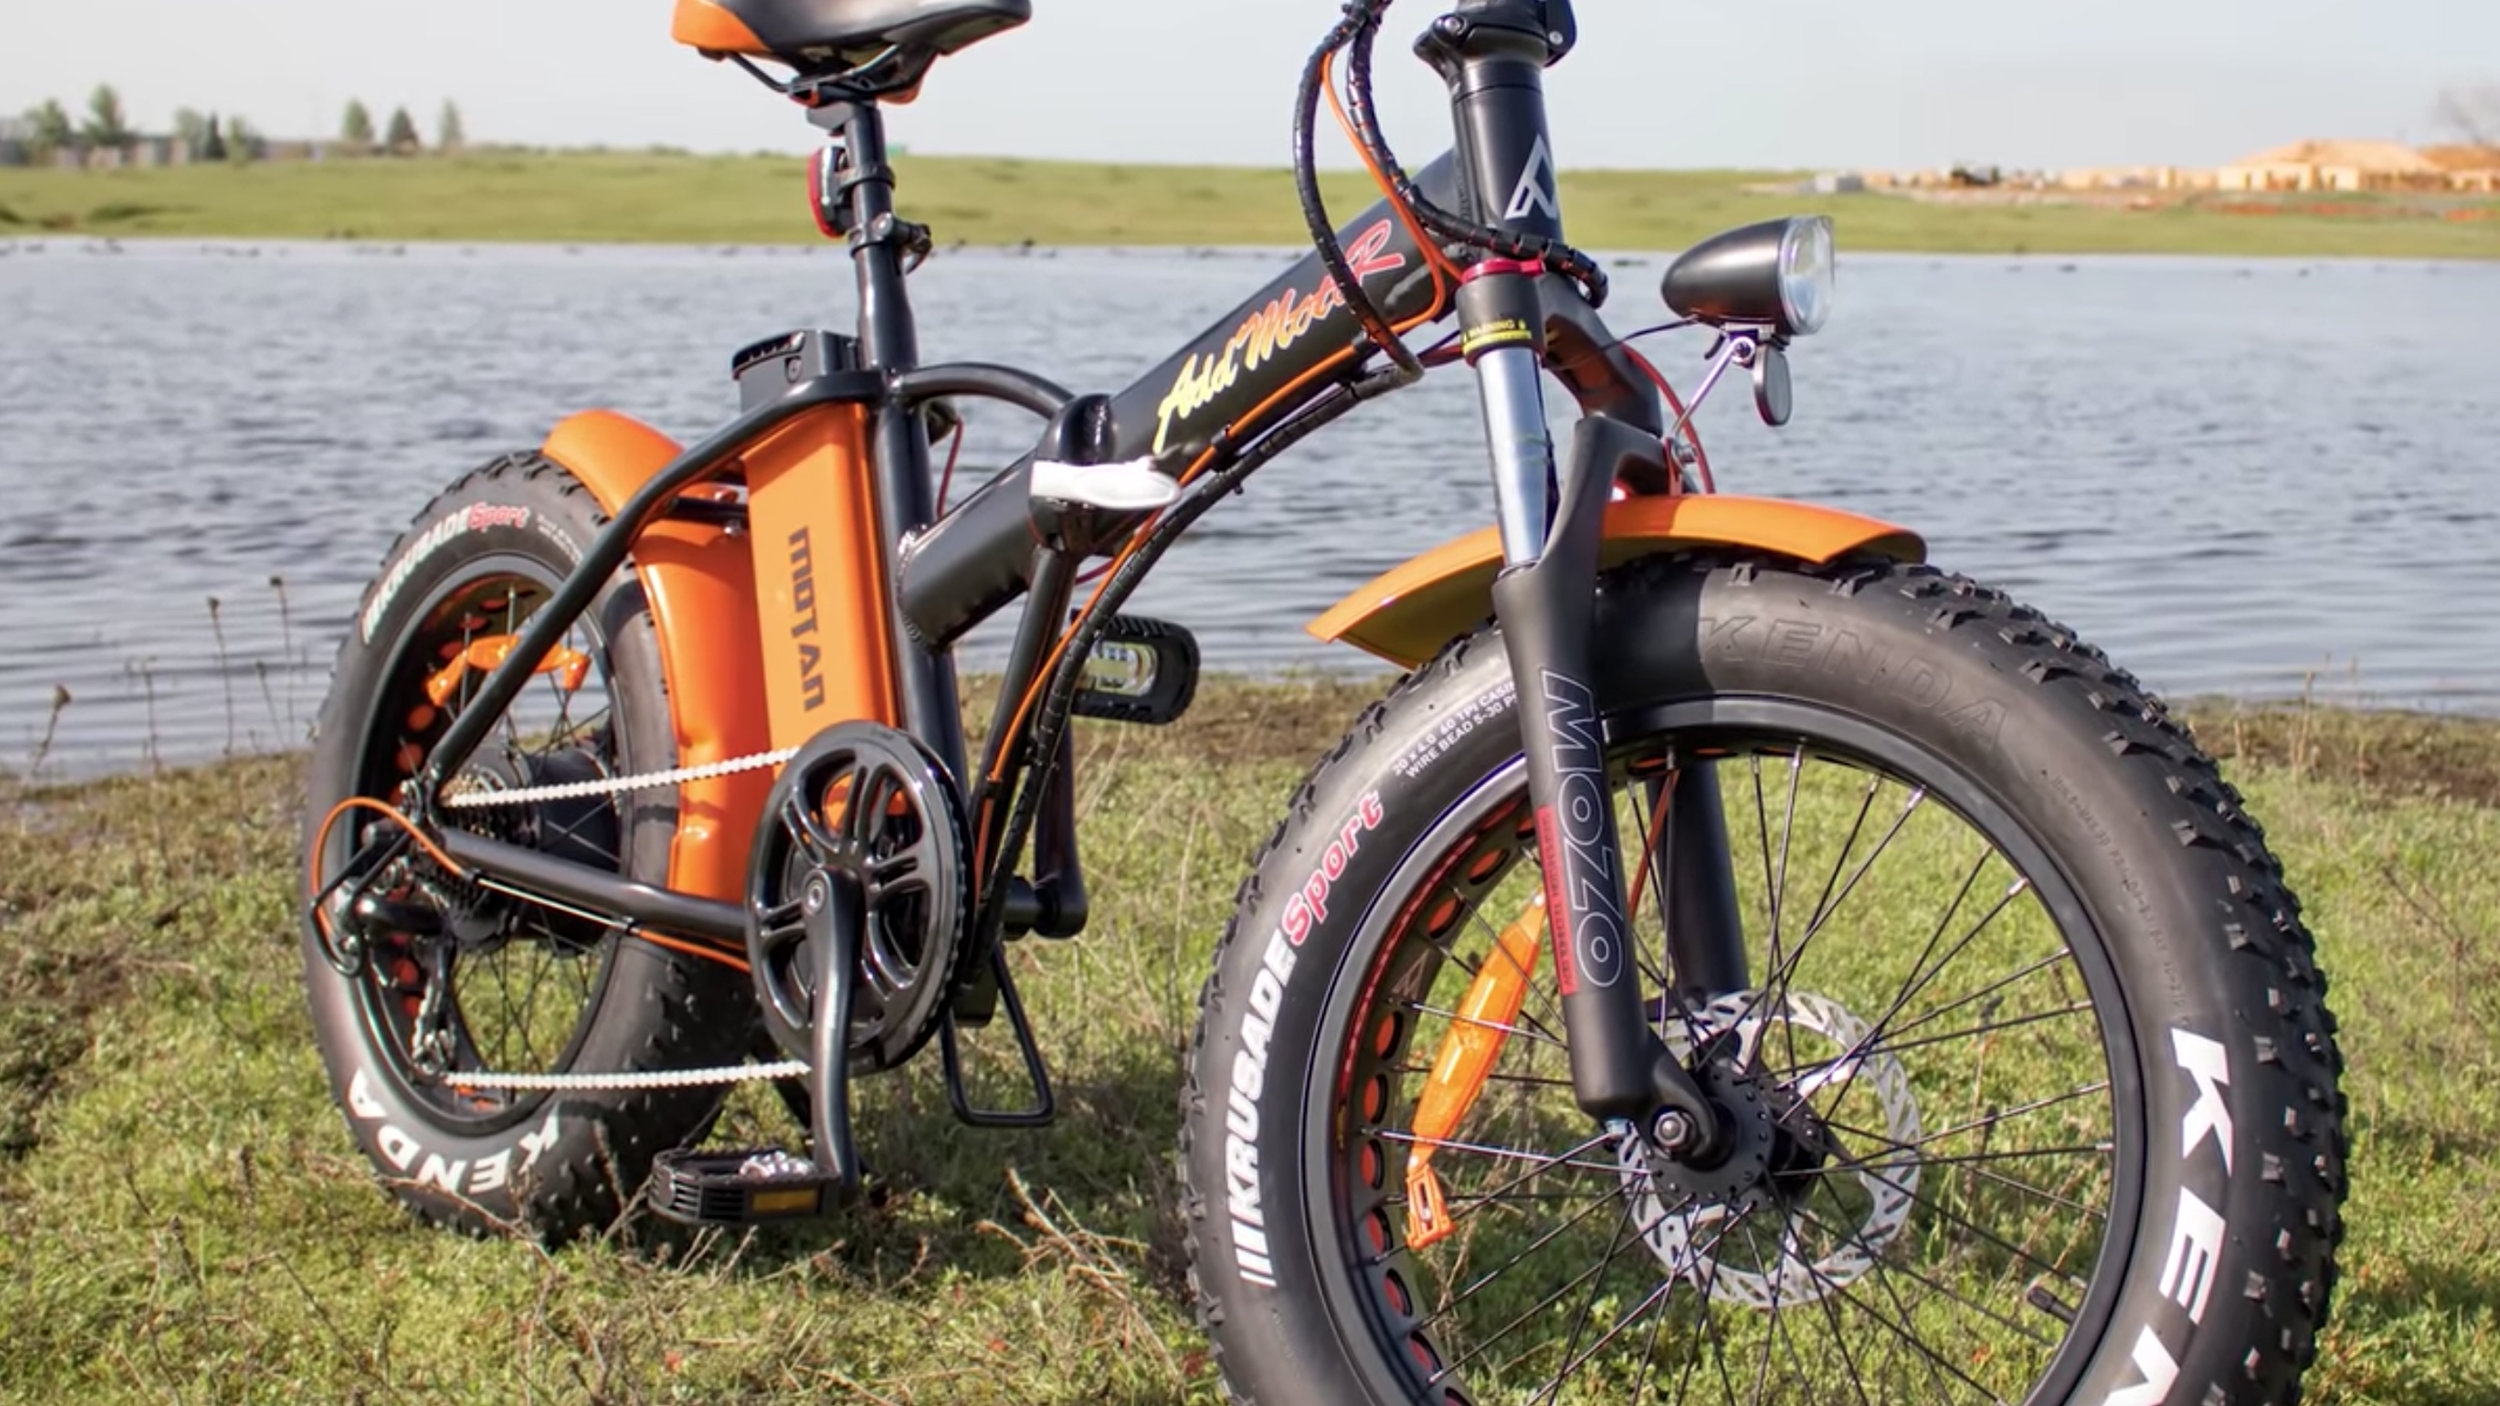 electrified-reviews-addmotor-motan-m150p7-electric-bike-review-mozo-suspension.jpg